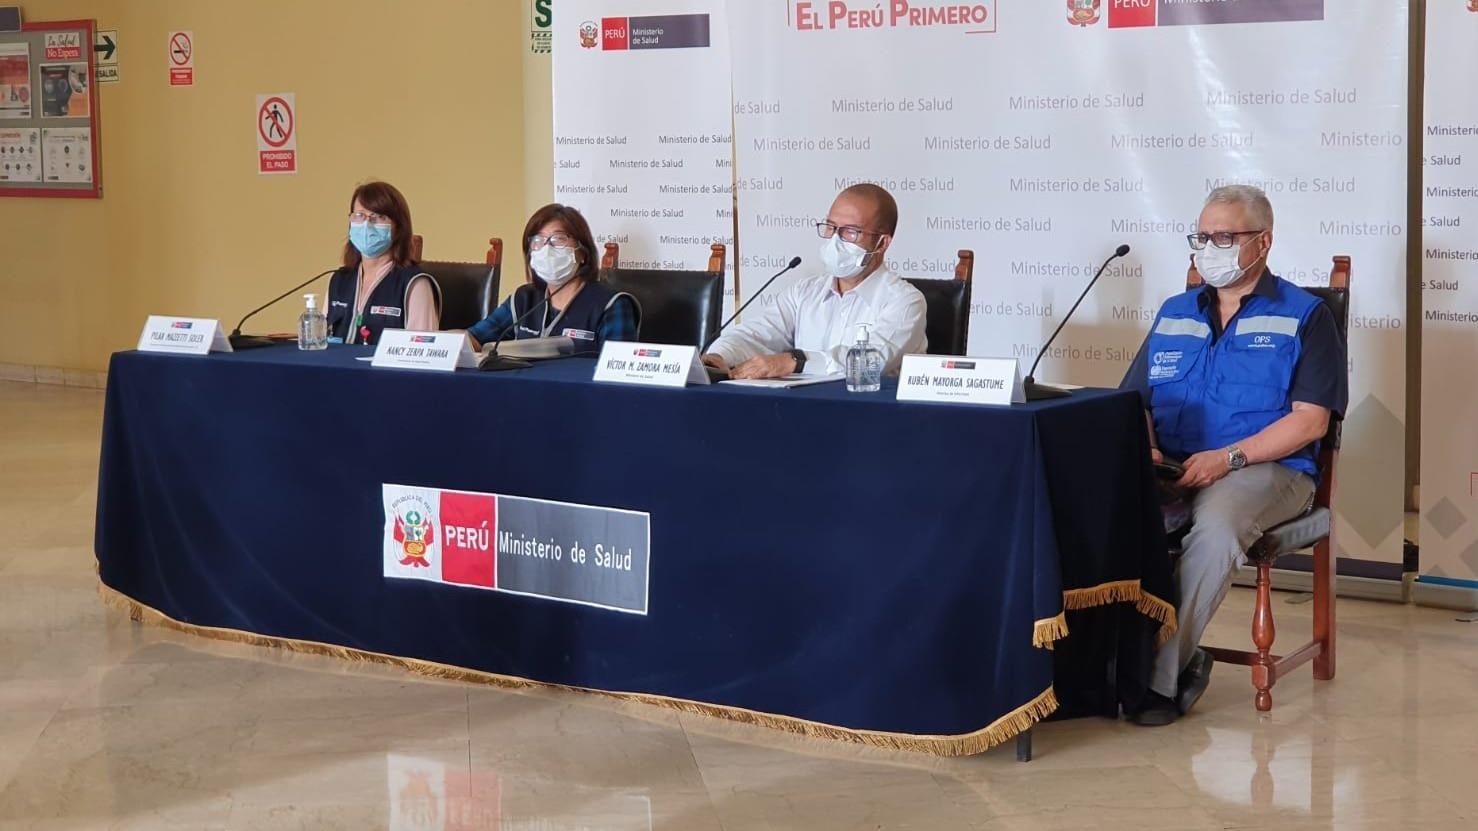 El ministro Zamora informa sobre las acciones del Minsa ante la COVID-19.